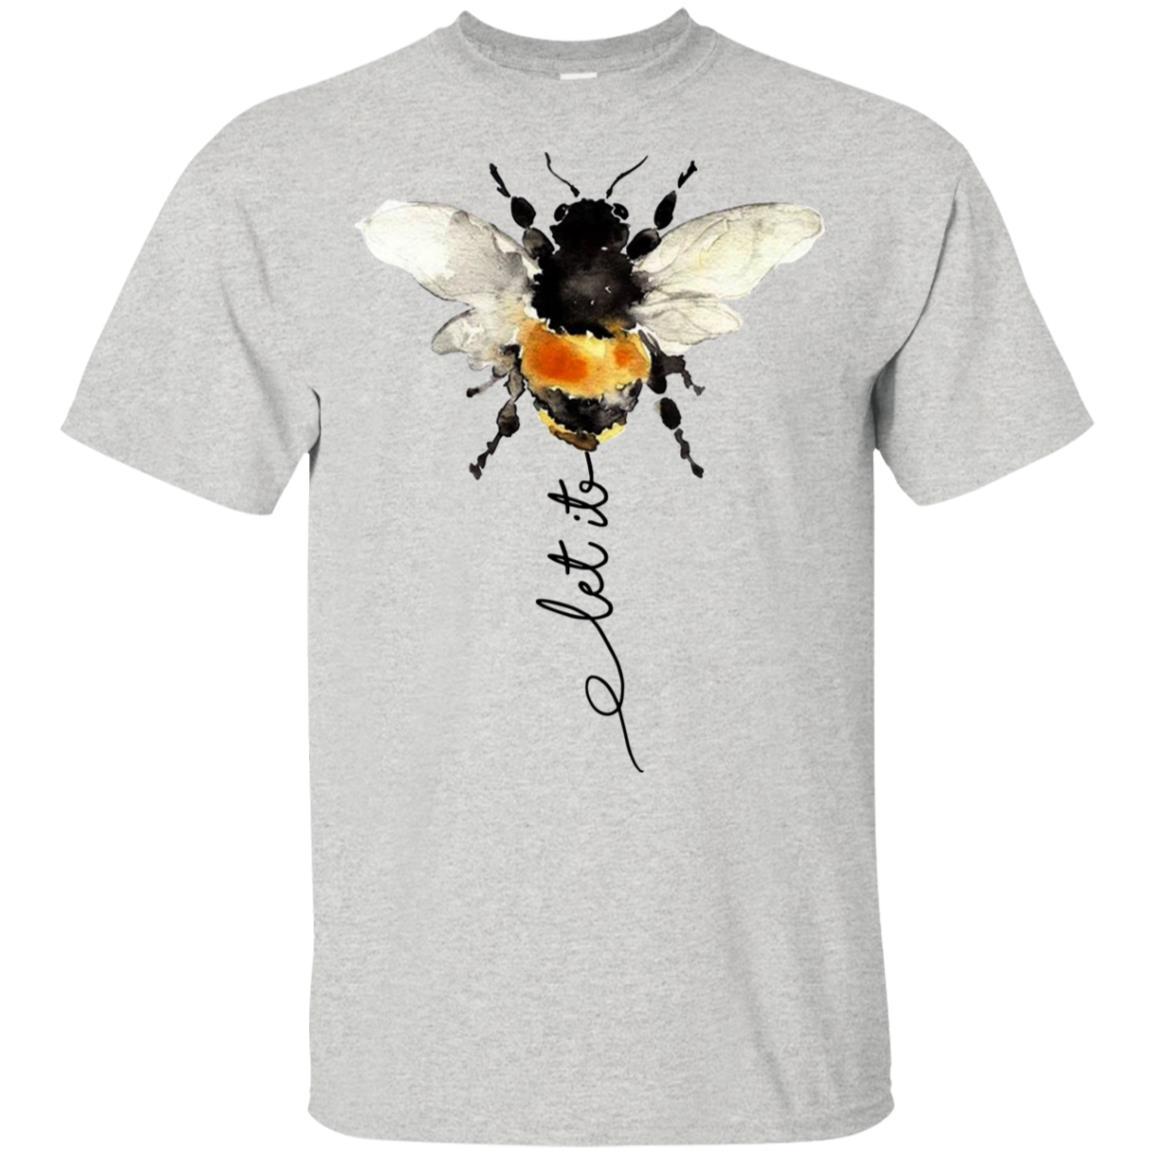 3c5f8fcf Let it bee t shirt, tank, hoodie - RobinPlaceFabrics